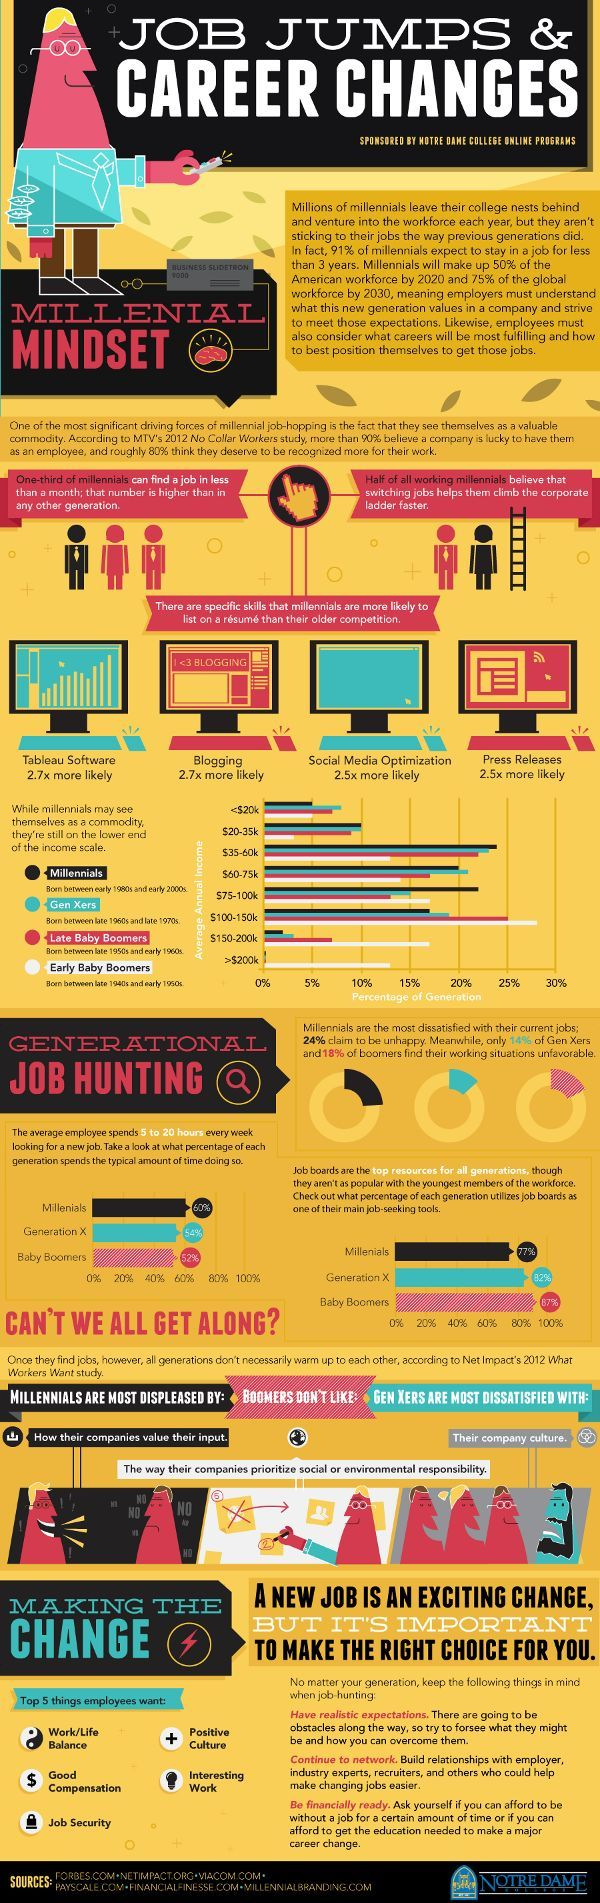 Job Jumps and Career Changes [infographic] [http://www.dodgen.co] #careerguidance #careerplanning